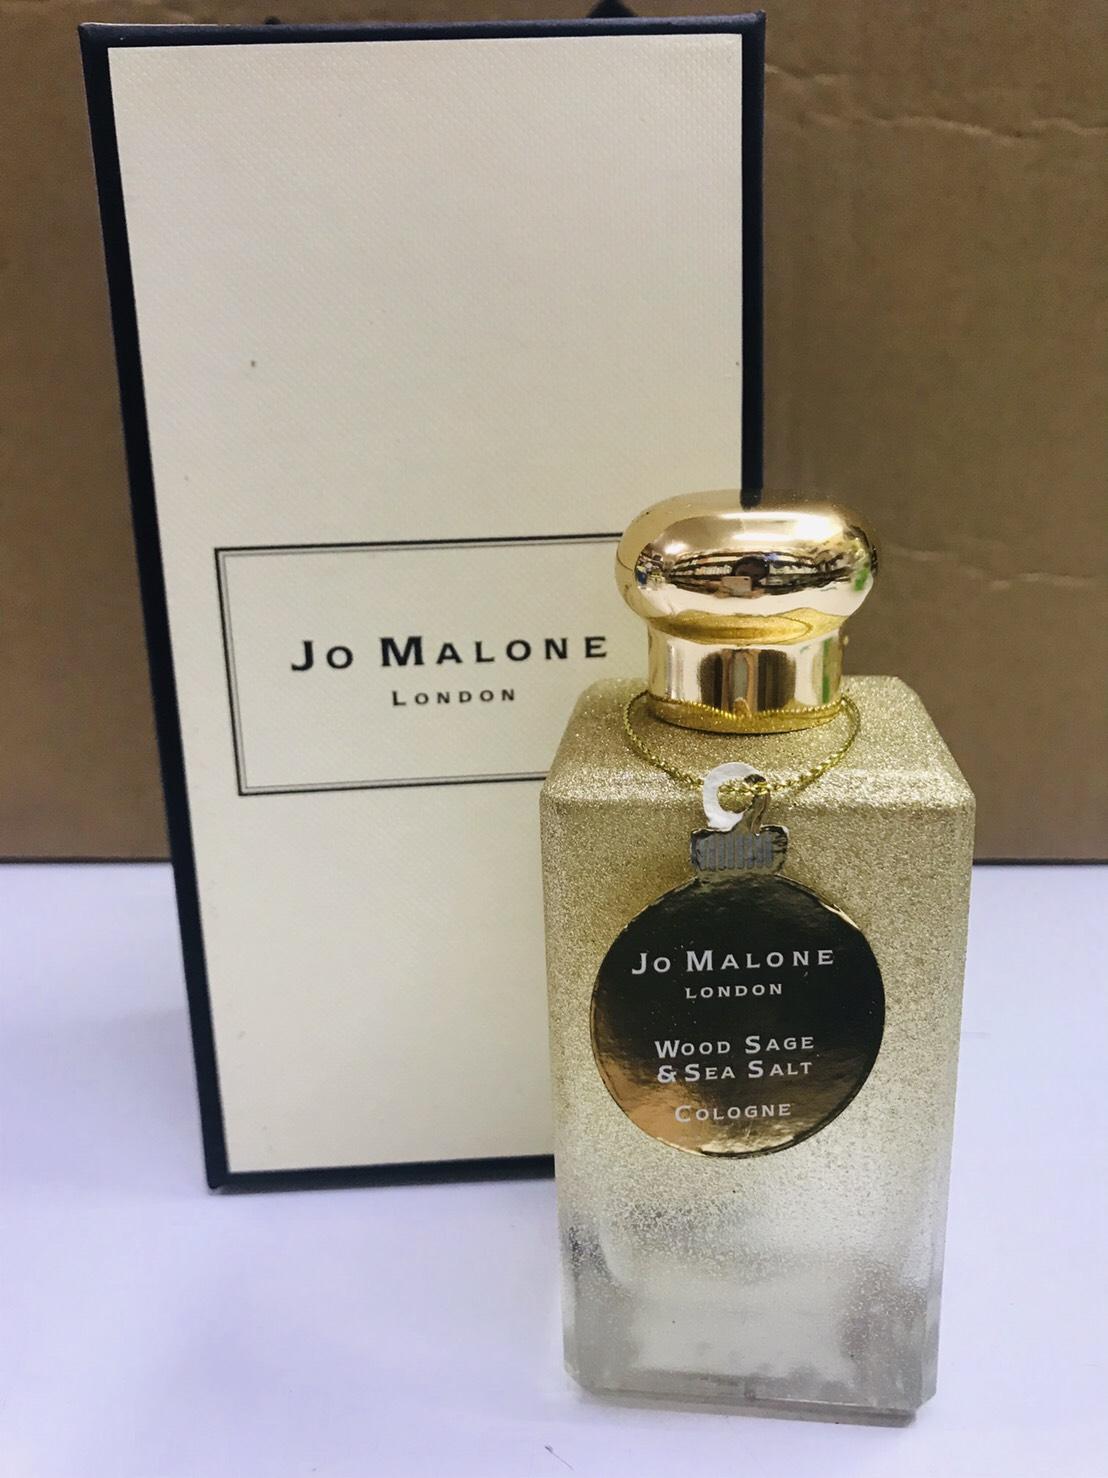 JO MALONE LONDON Wood Sage  Sea Salt Cologne  100ml. งานพร้อมกล่อง ขวดสีทองลิมิเต็ด